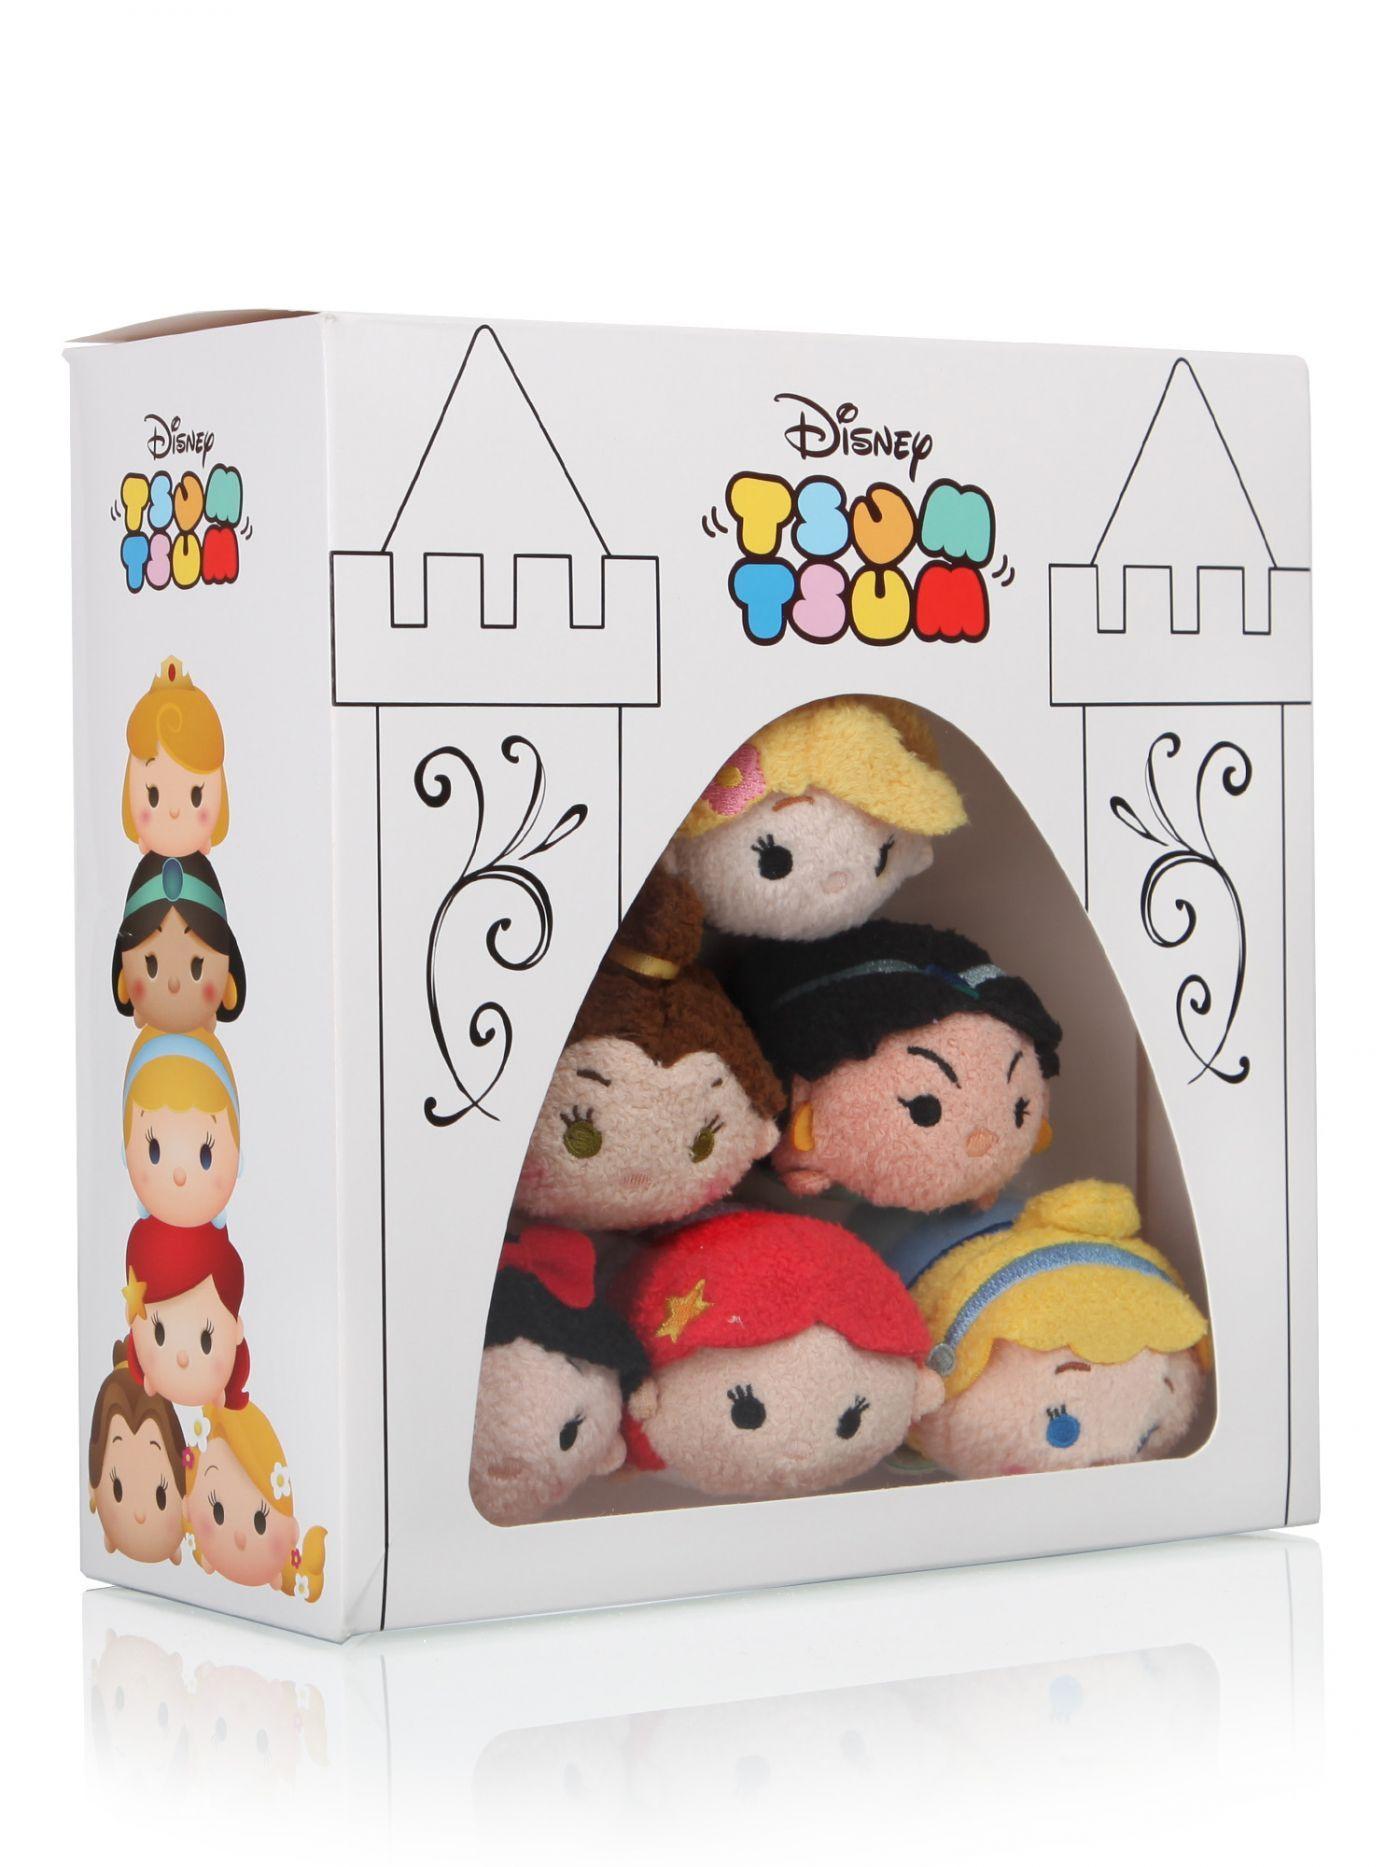 Disney Princess Tsum Tsum Set - Disney Tsum Tsum - Soft Toys - Gifts ...